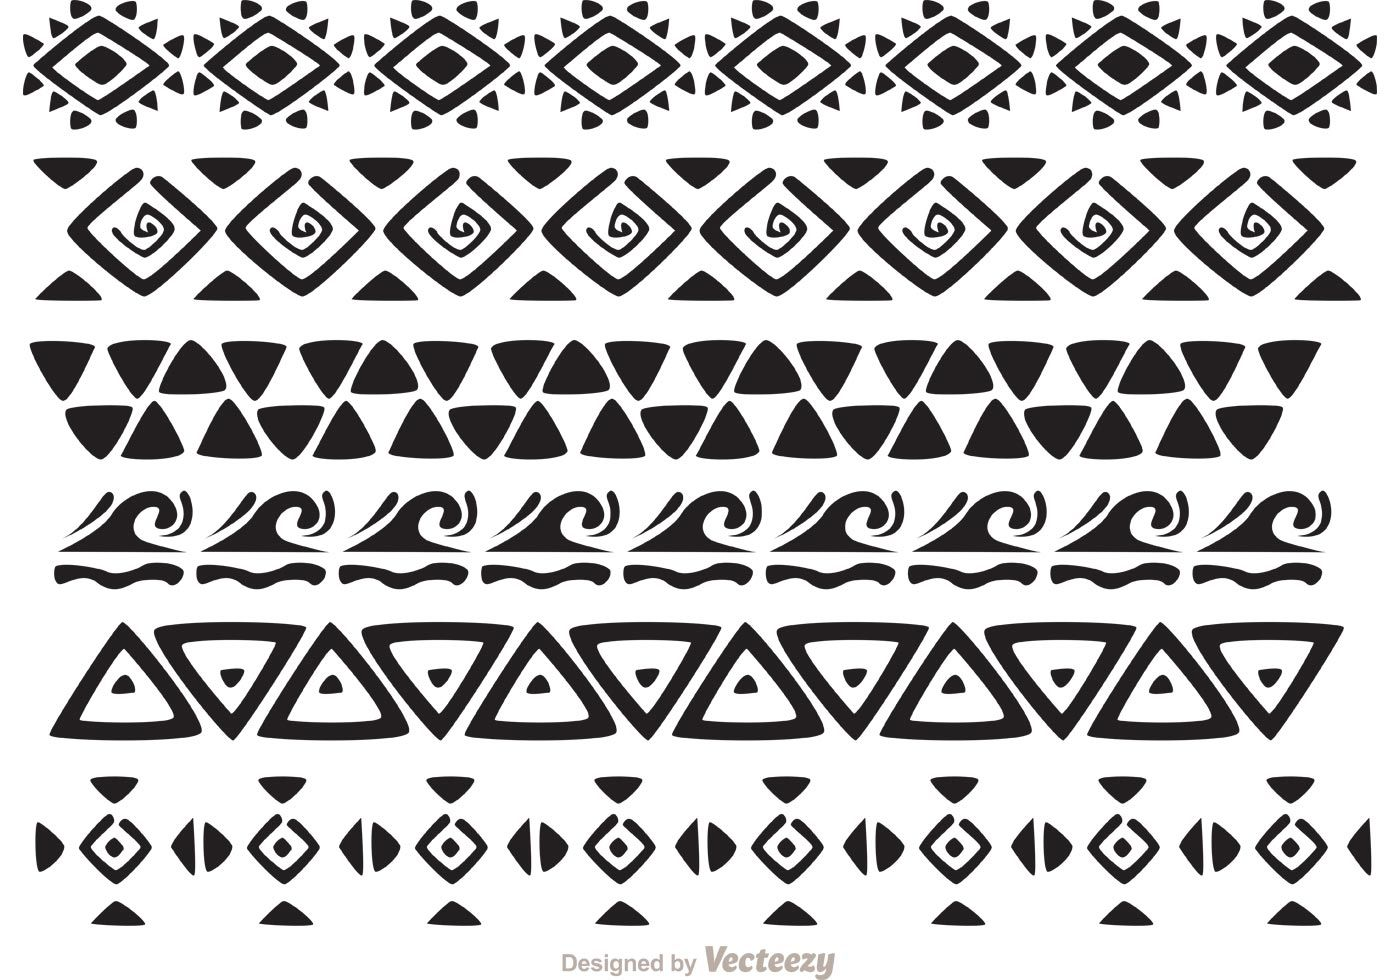 1cda926832f05 Hawaiian Tribal Pattern Vectors Pack 2 - another awesome Hawaiian tribal  pattern pack with tribal border vectors, geometric patterns, and more.